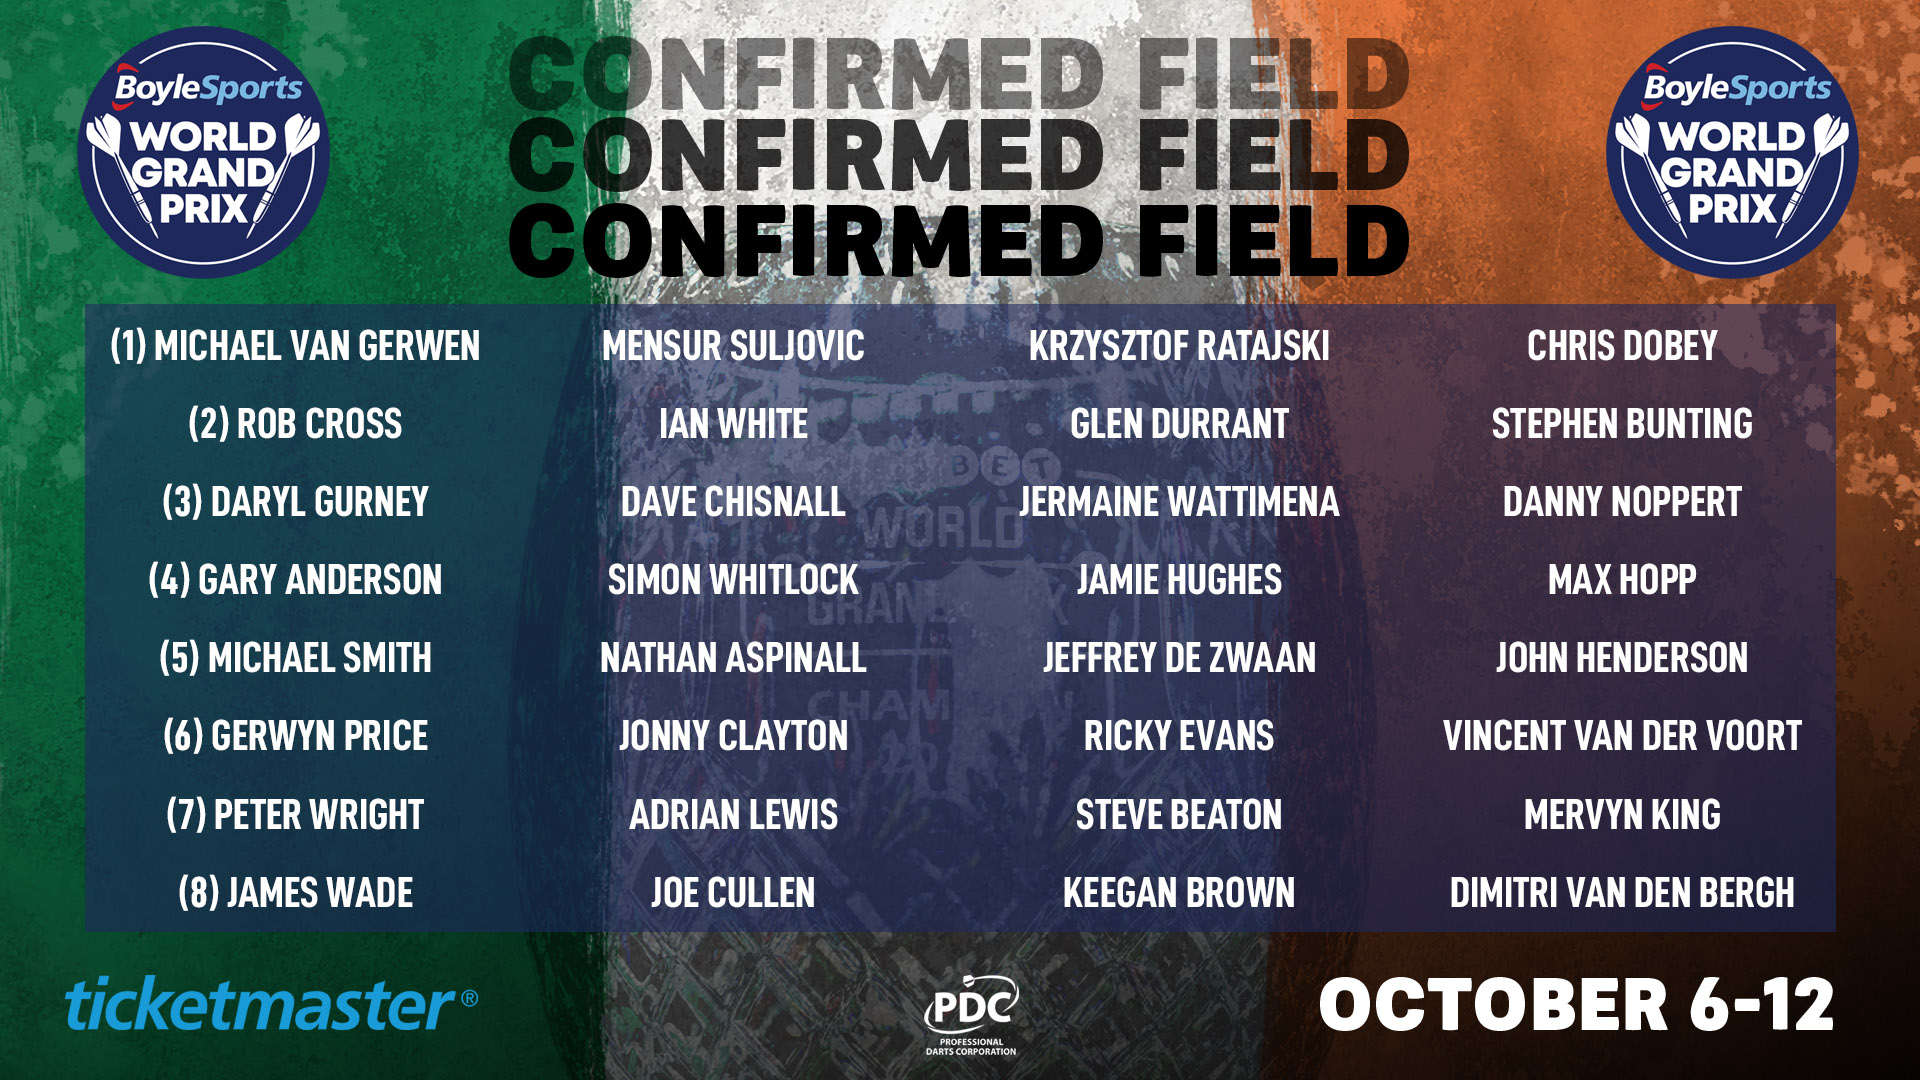 2019 World Grand Prix field (PDC)